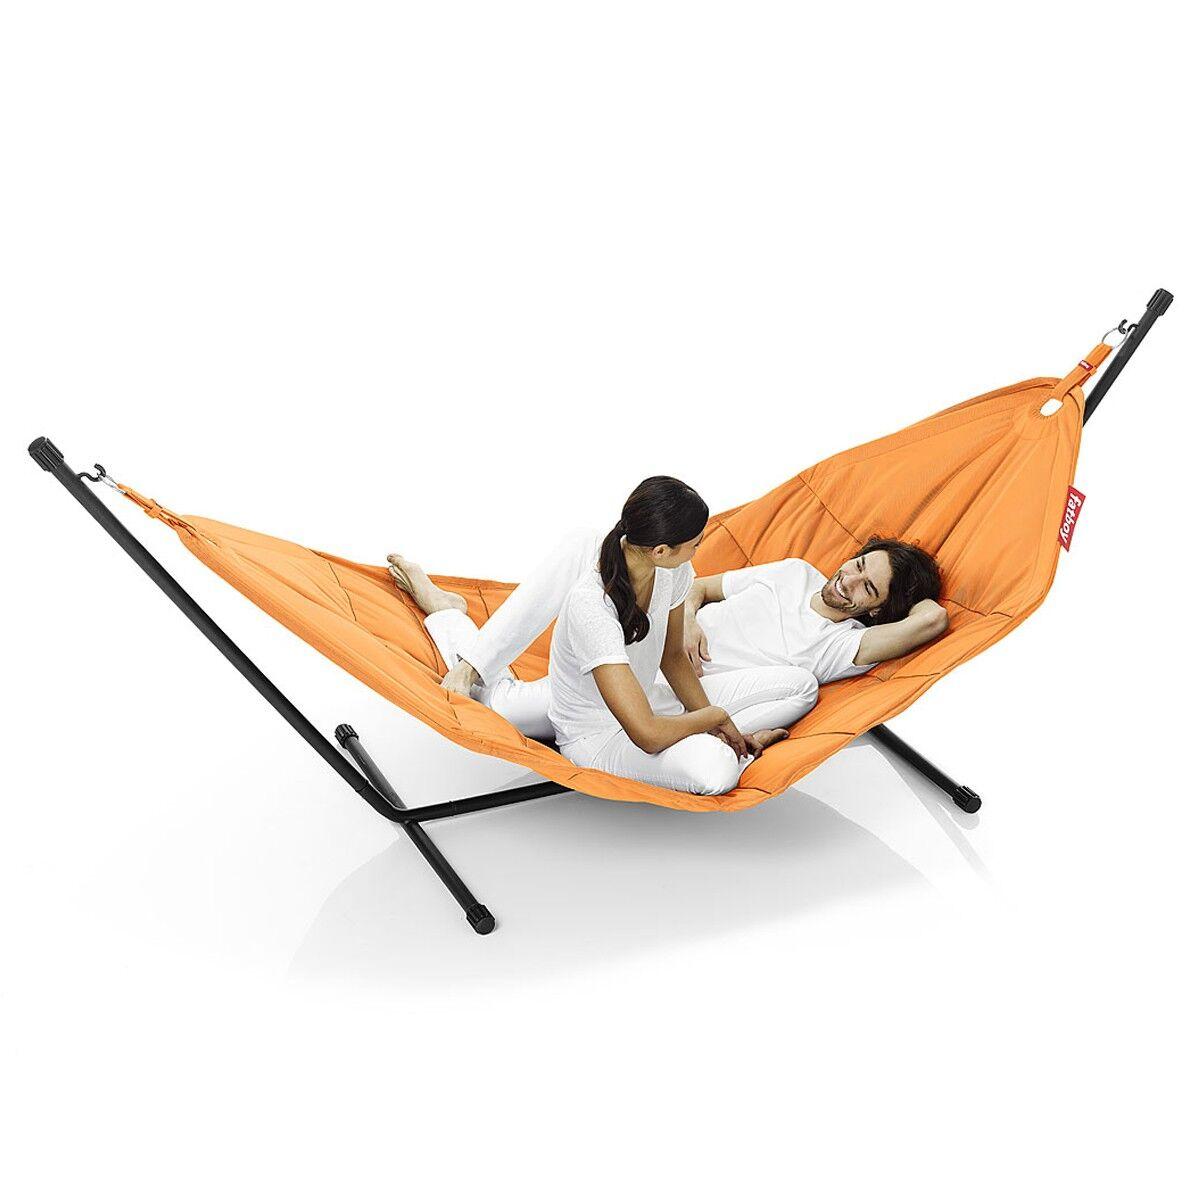 FATBOY hamac HEADDEMOCK (Orange - polyester)